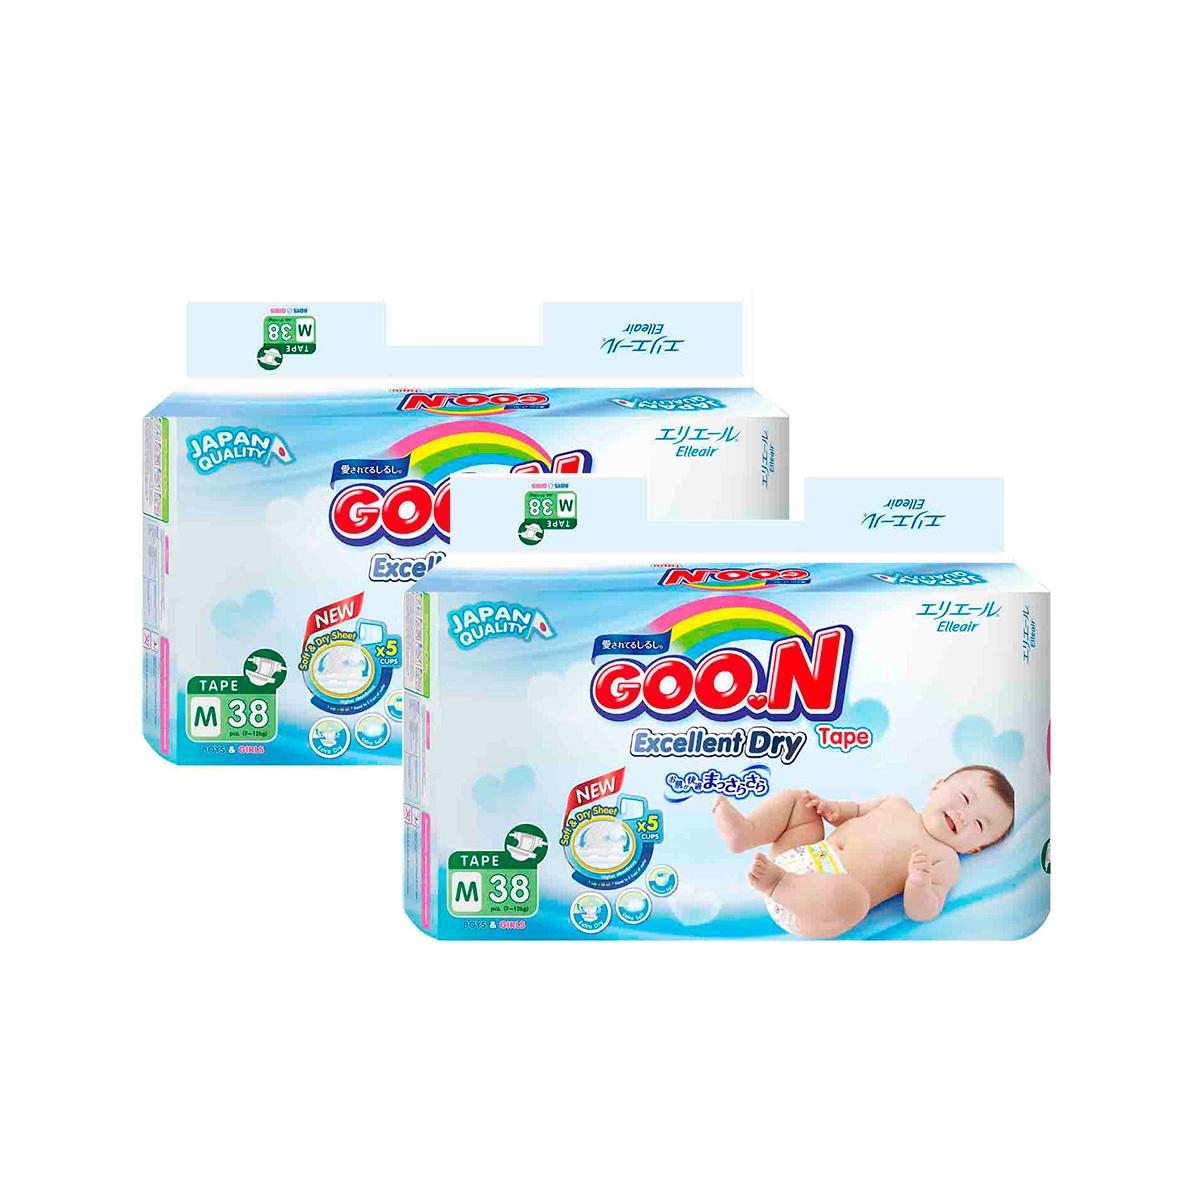 Ni Bn Bm Goon Dn Slim Gi R Uy Tn Cht Lng Nht Excellent Dry Tape L32